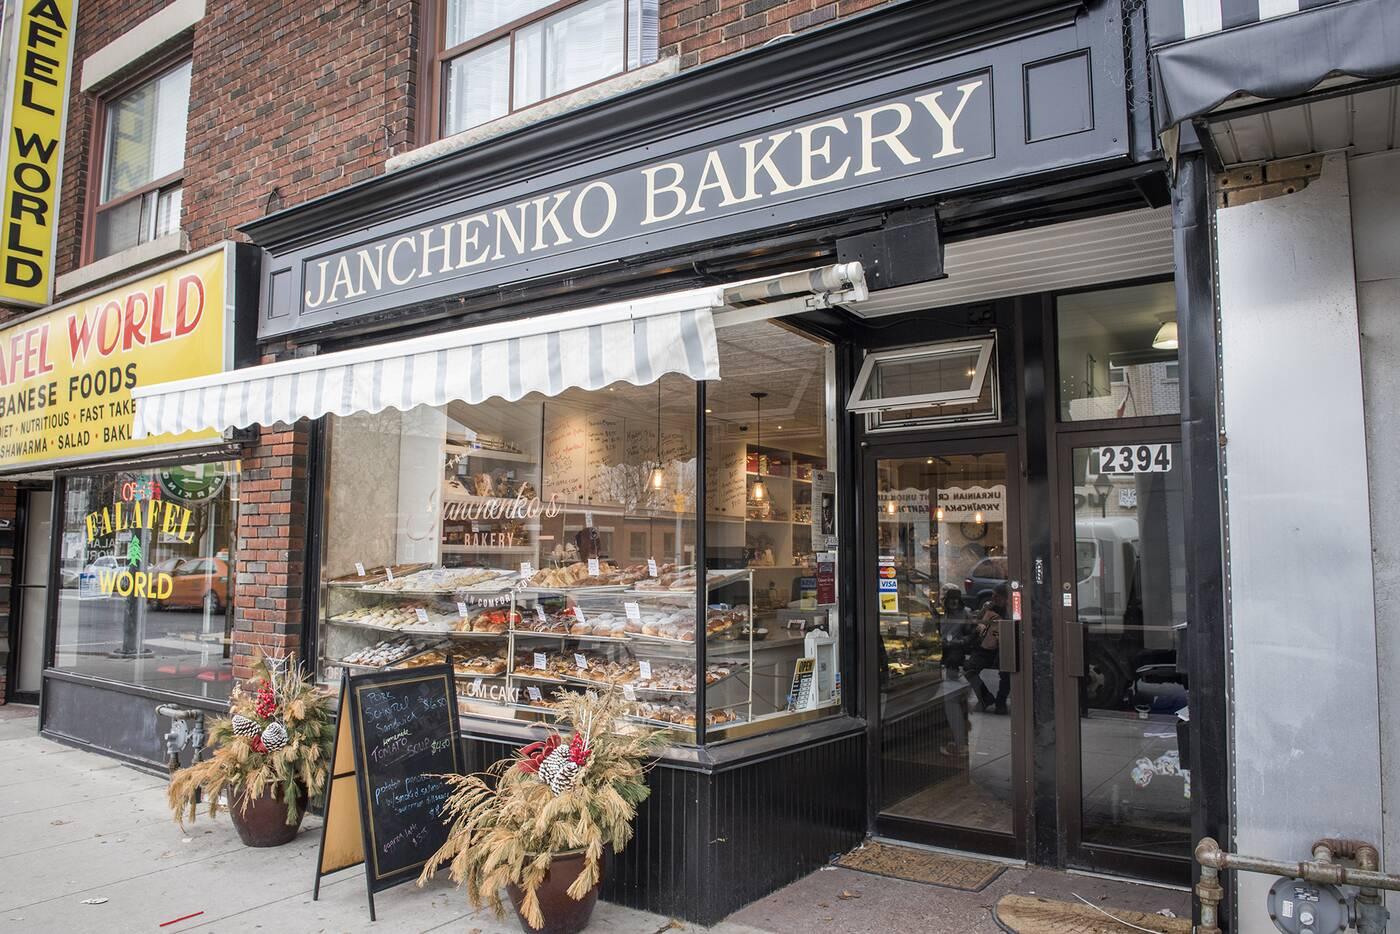 Janchenko Bakery Toronto